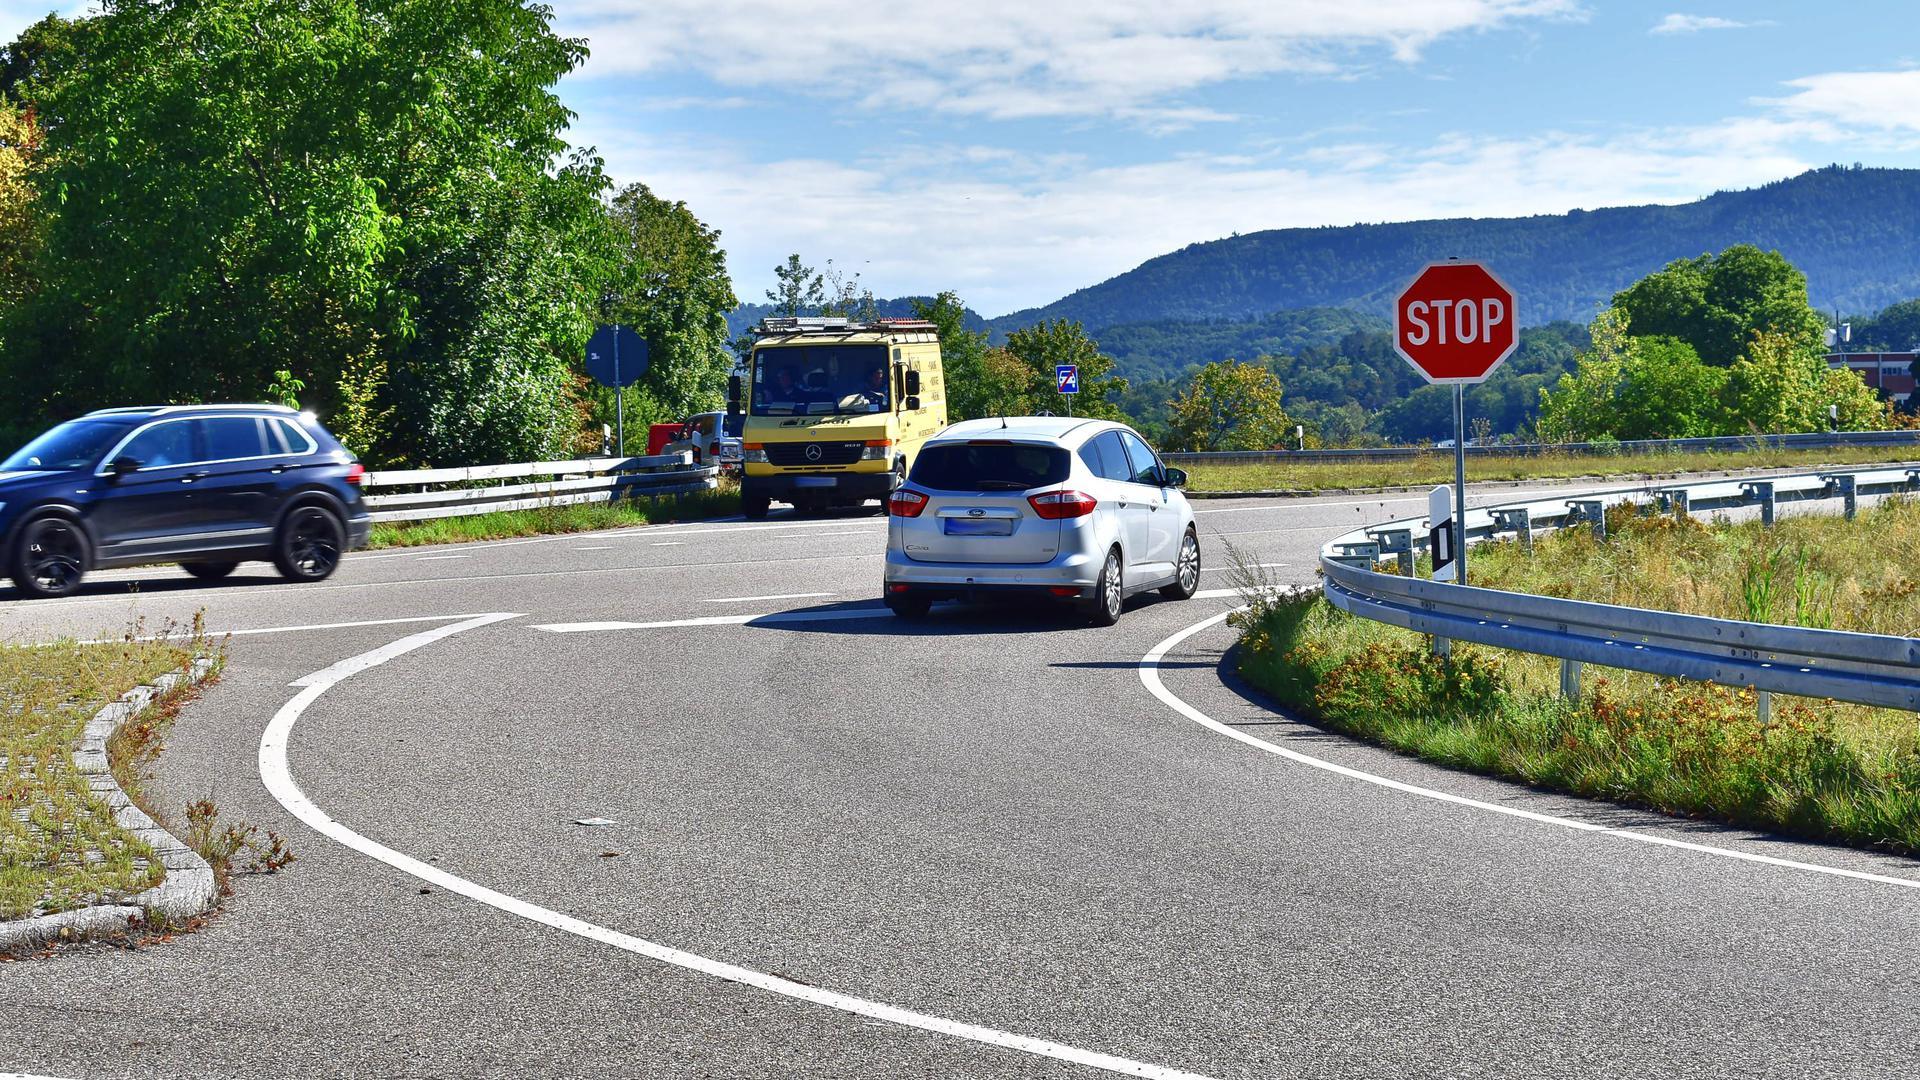 Pkw an Stop-Schild